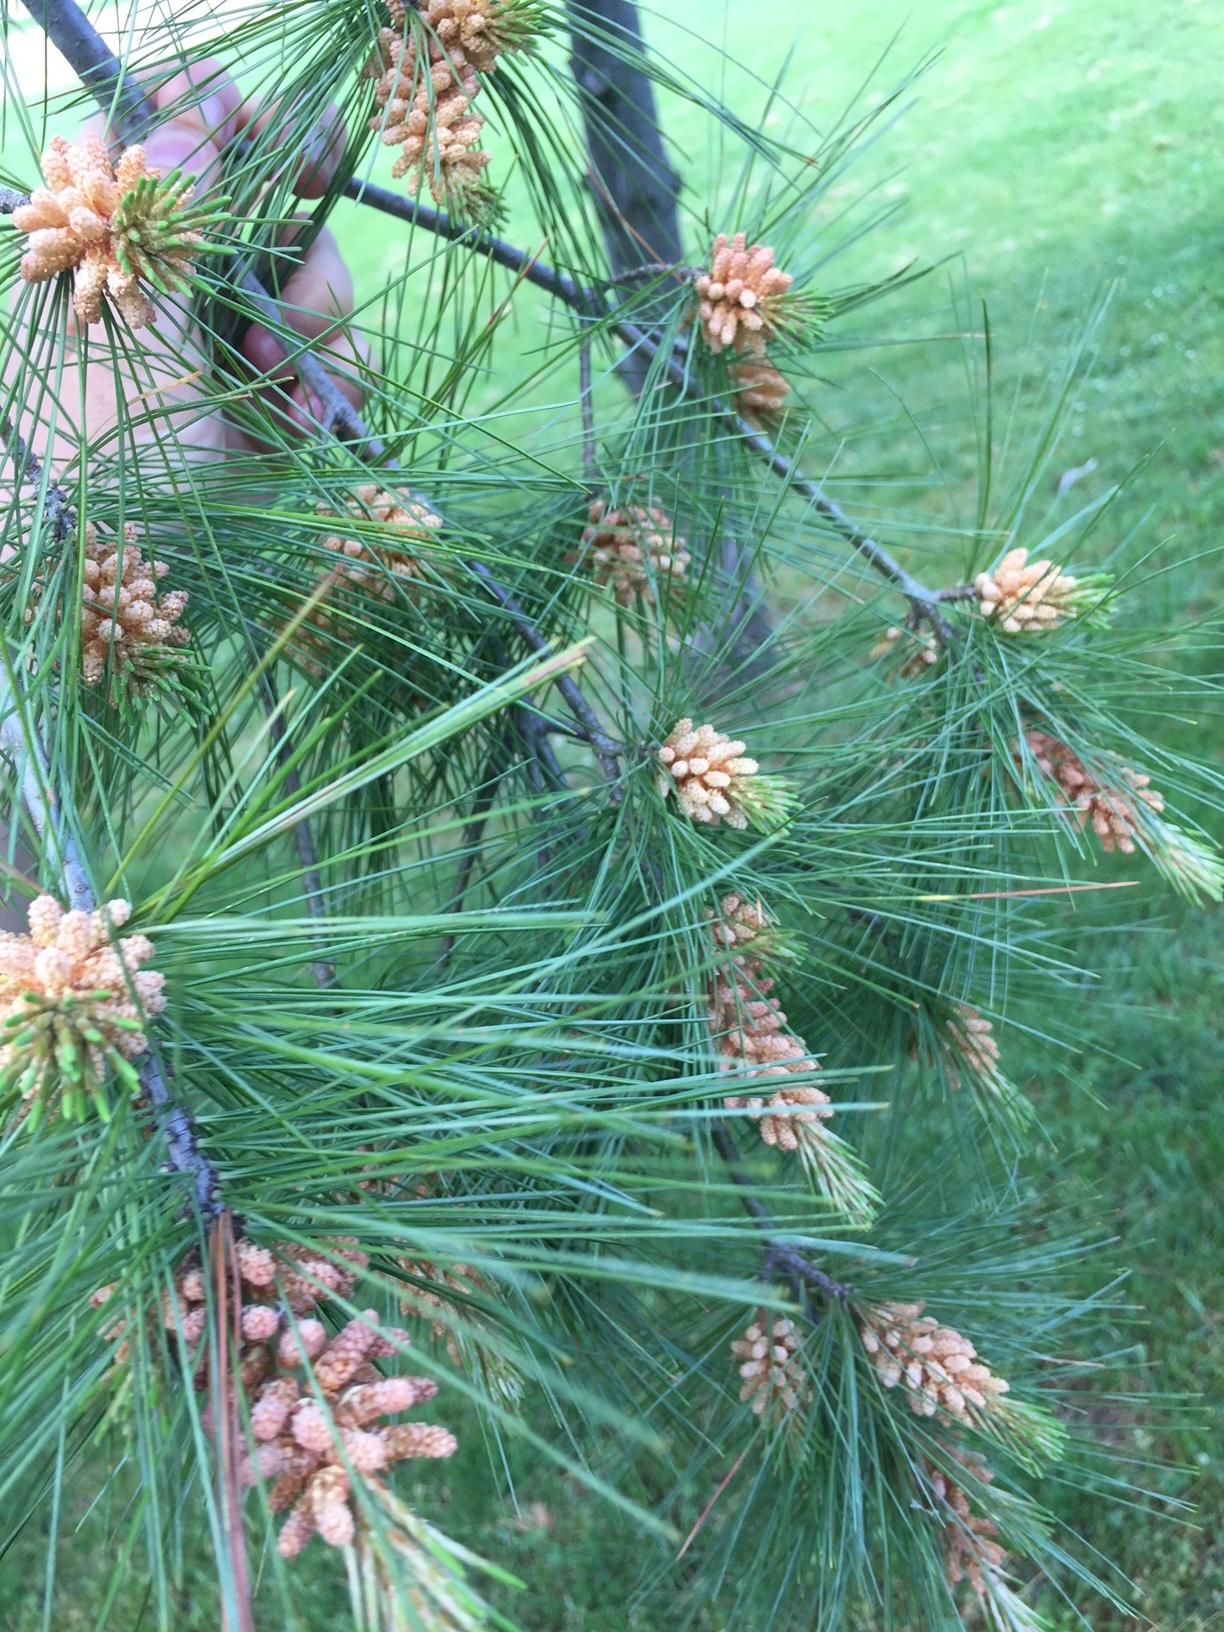 Pine pollen cones from my most recent harvest.